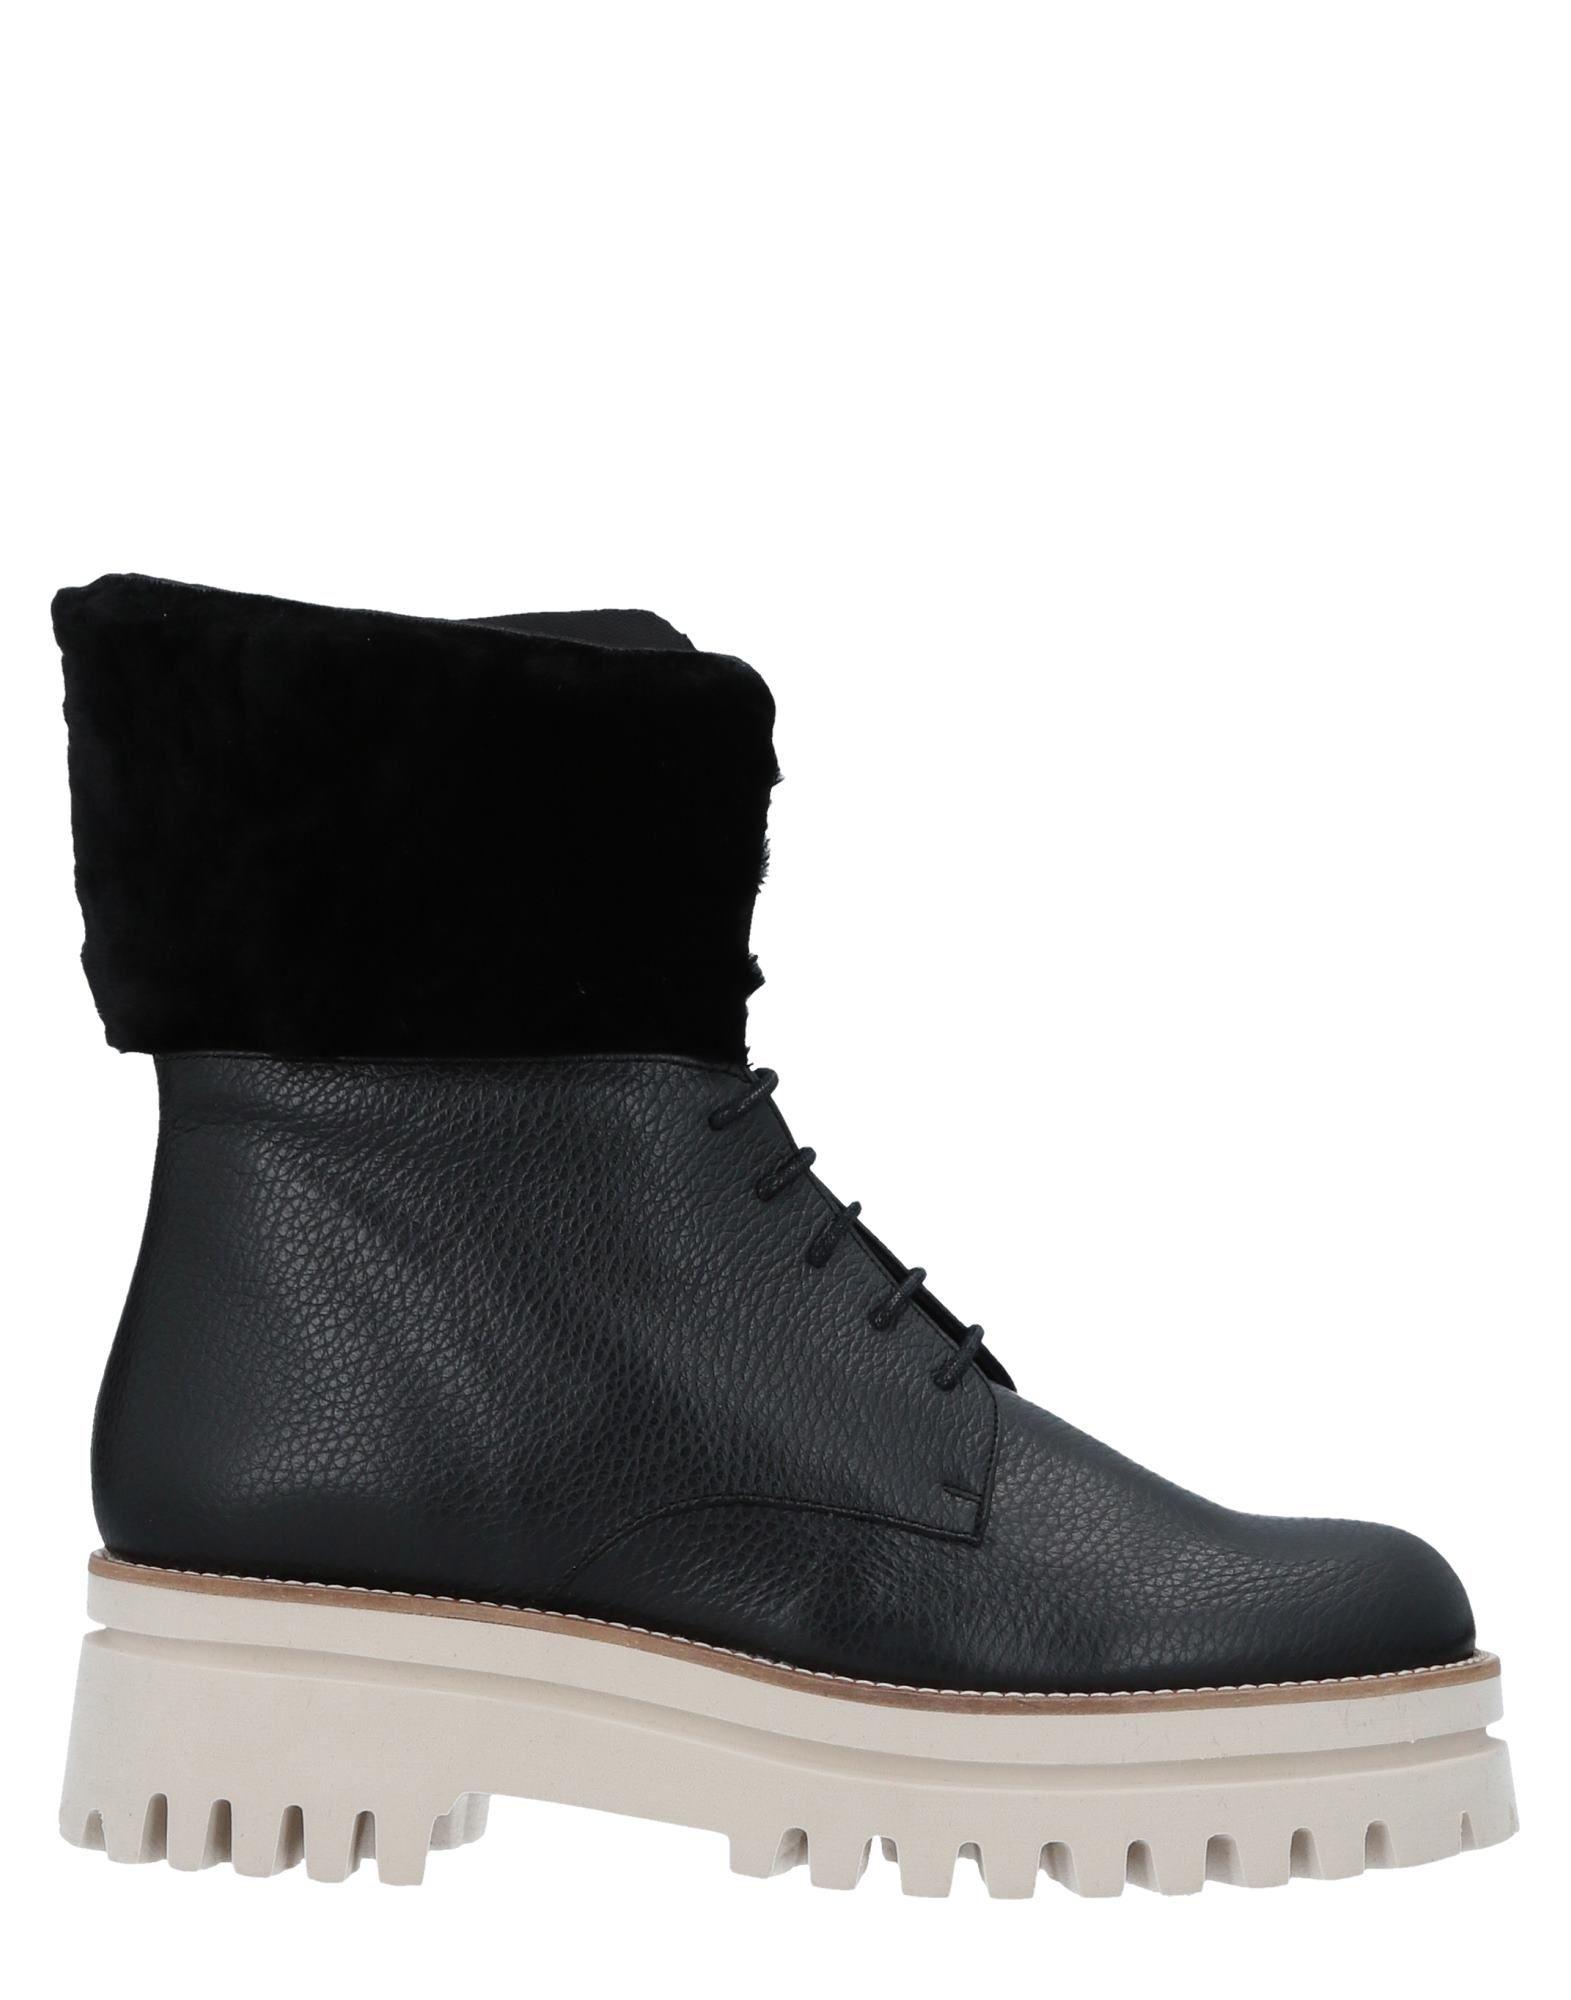 Stilvolle billige Schuhe Paloma Barceló Stiefelette Damen  11513034KG